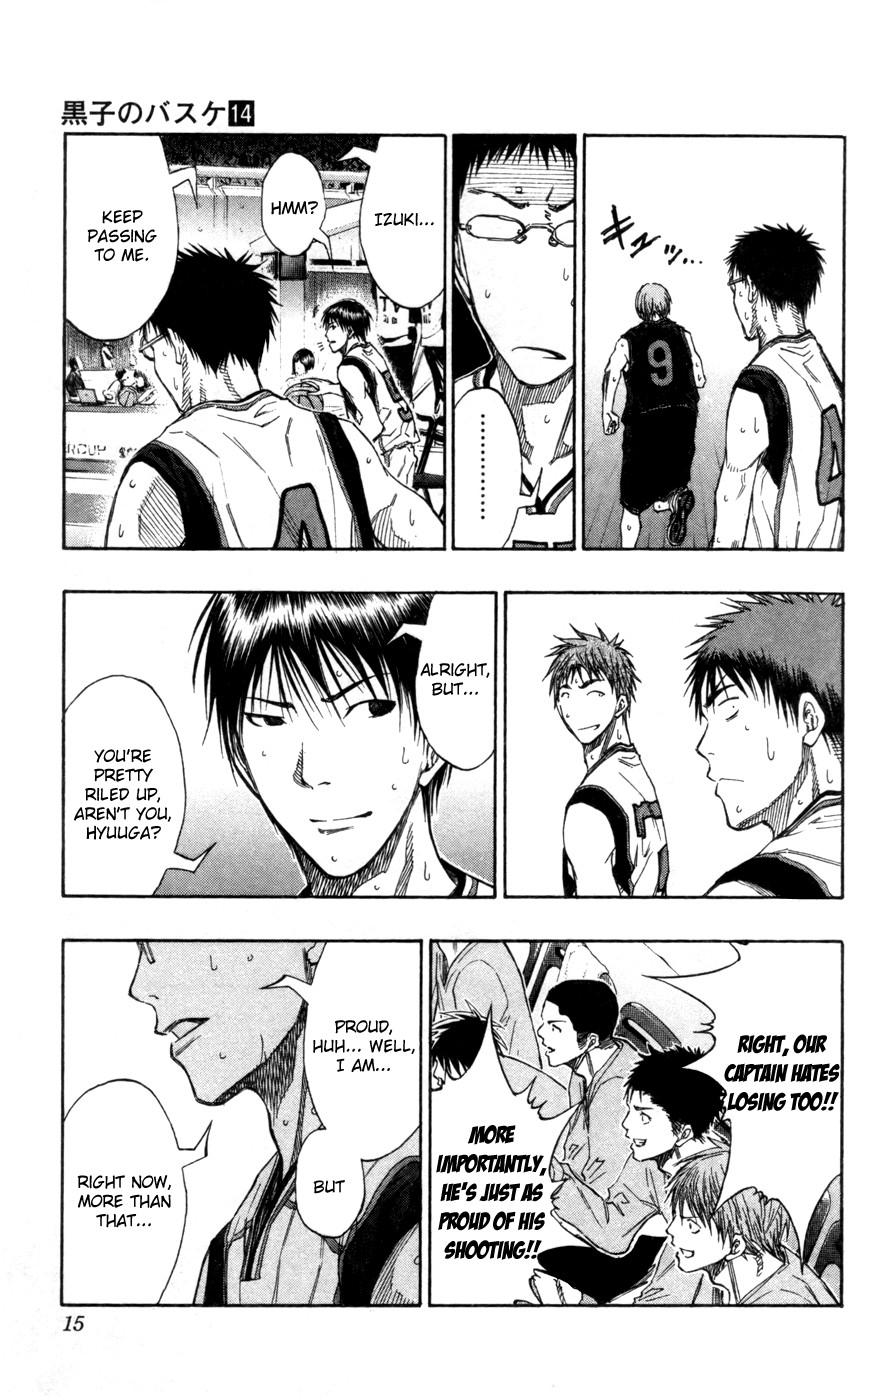 Kuroko no Basket Manga Chapter 118 - Image 4_015